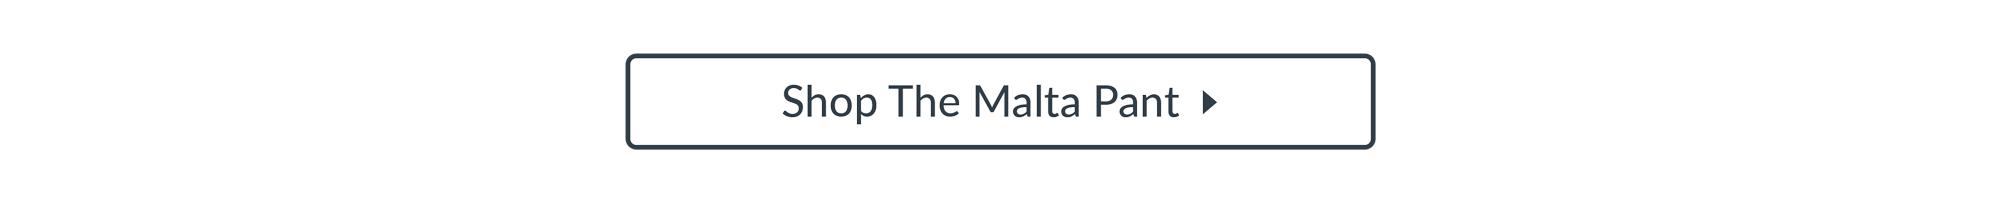 Shop the Malta Pant